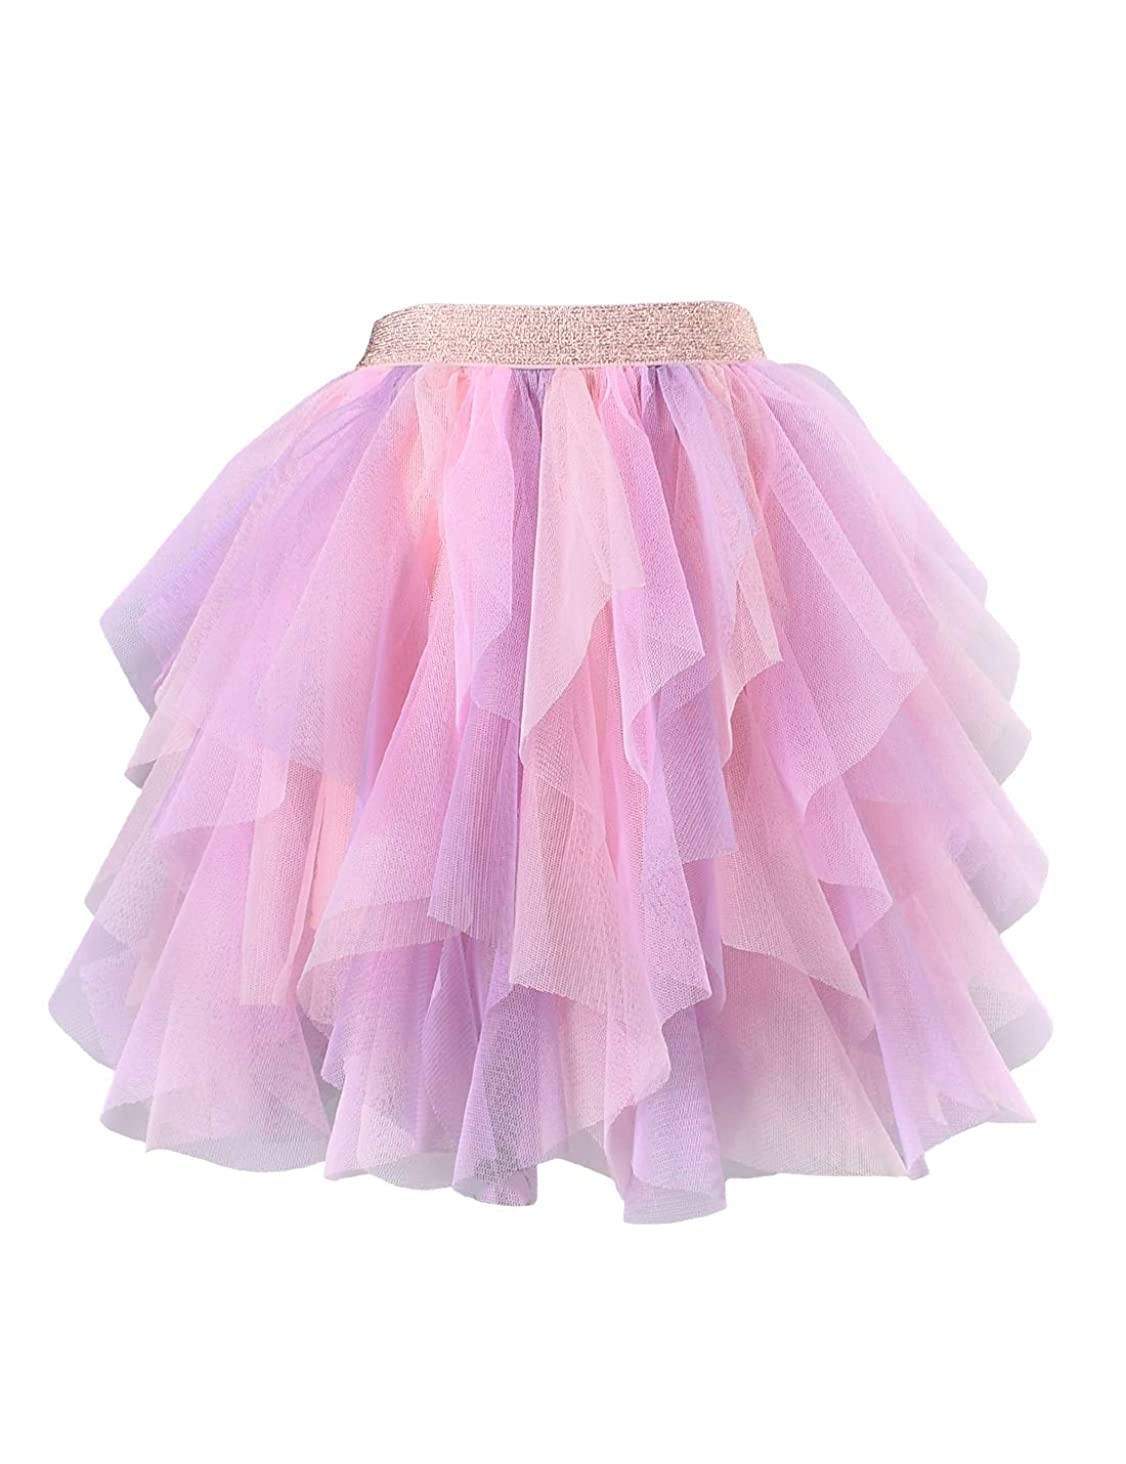 Kid Girls Rainbow Tutu Skirt Tulle Birthday Party Princess Skirt